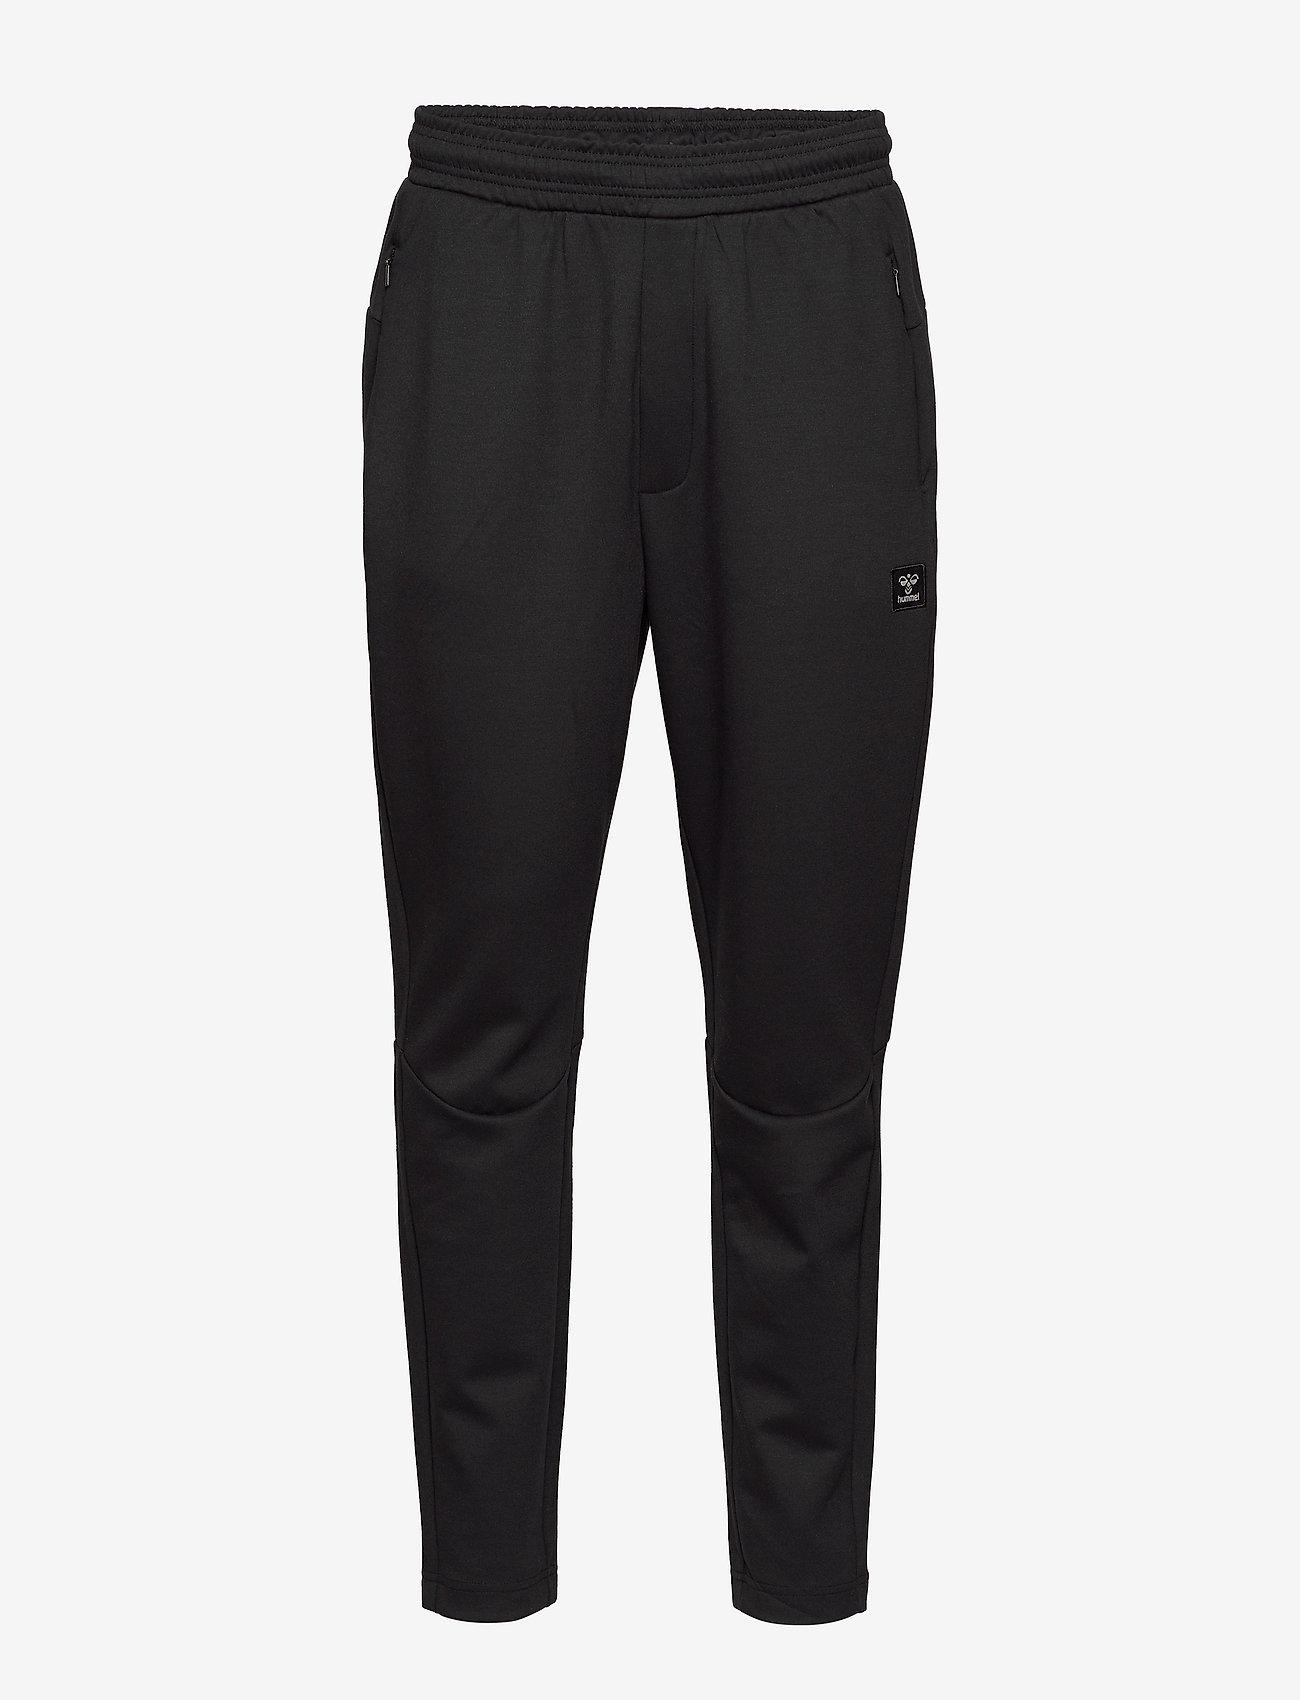 Hummel - hmlTROPPER TAPERED PANTS - pants - black - 0